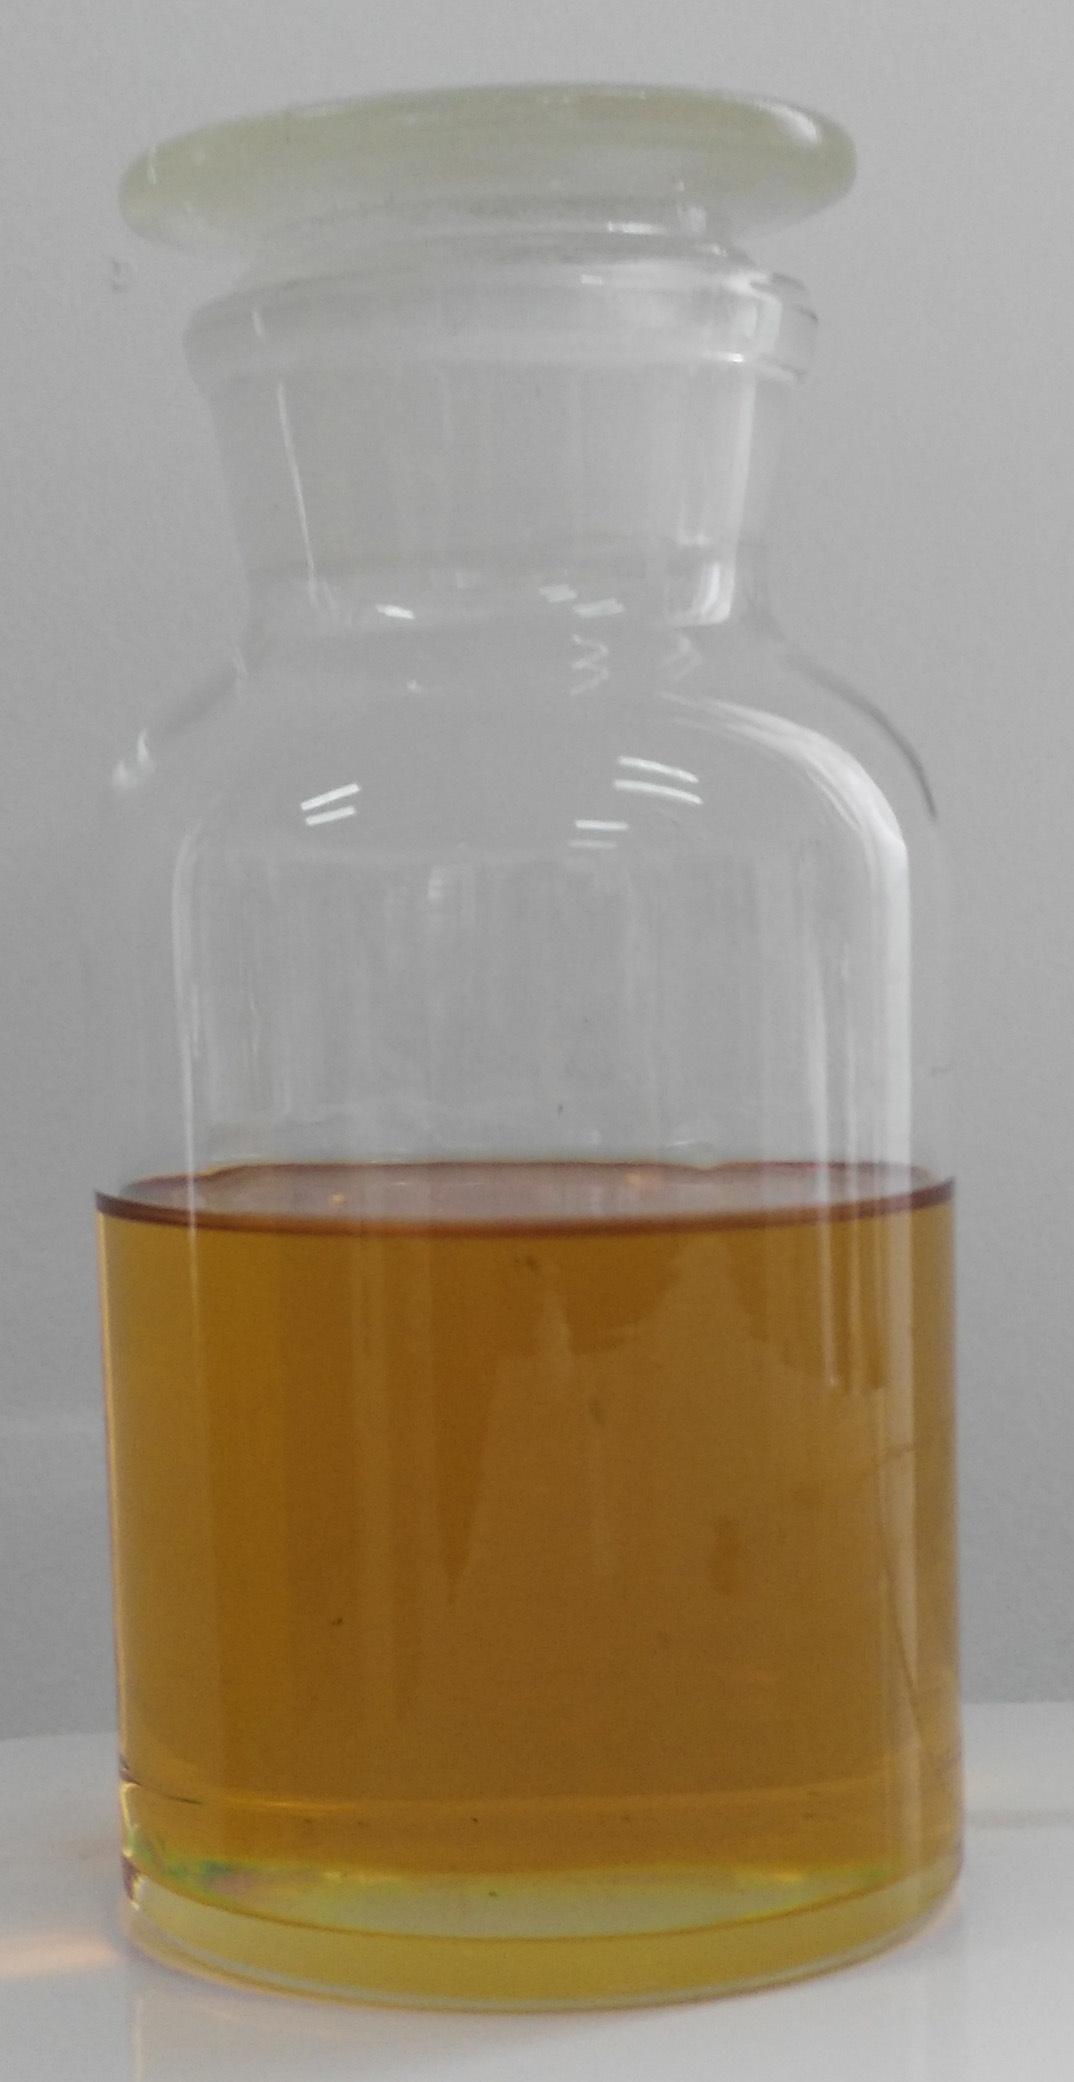 Low Toxicity Liquid Fluroxypyr of Herbicides